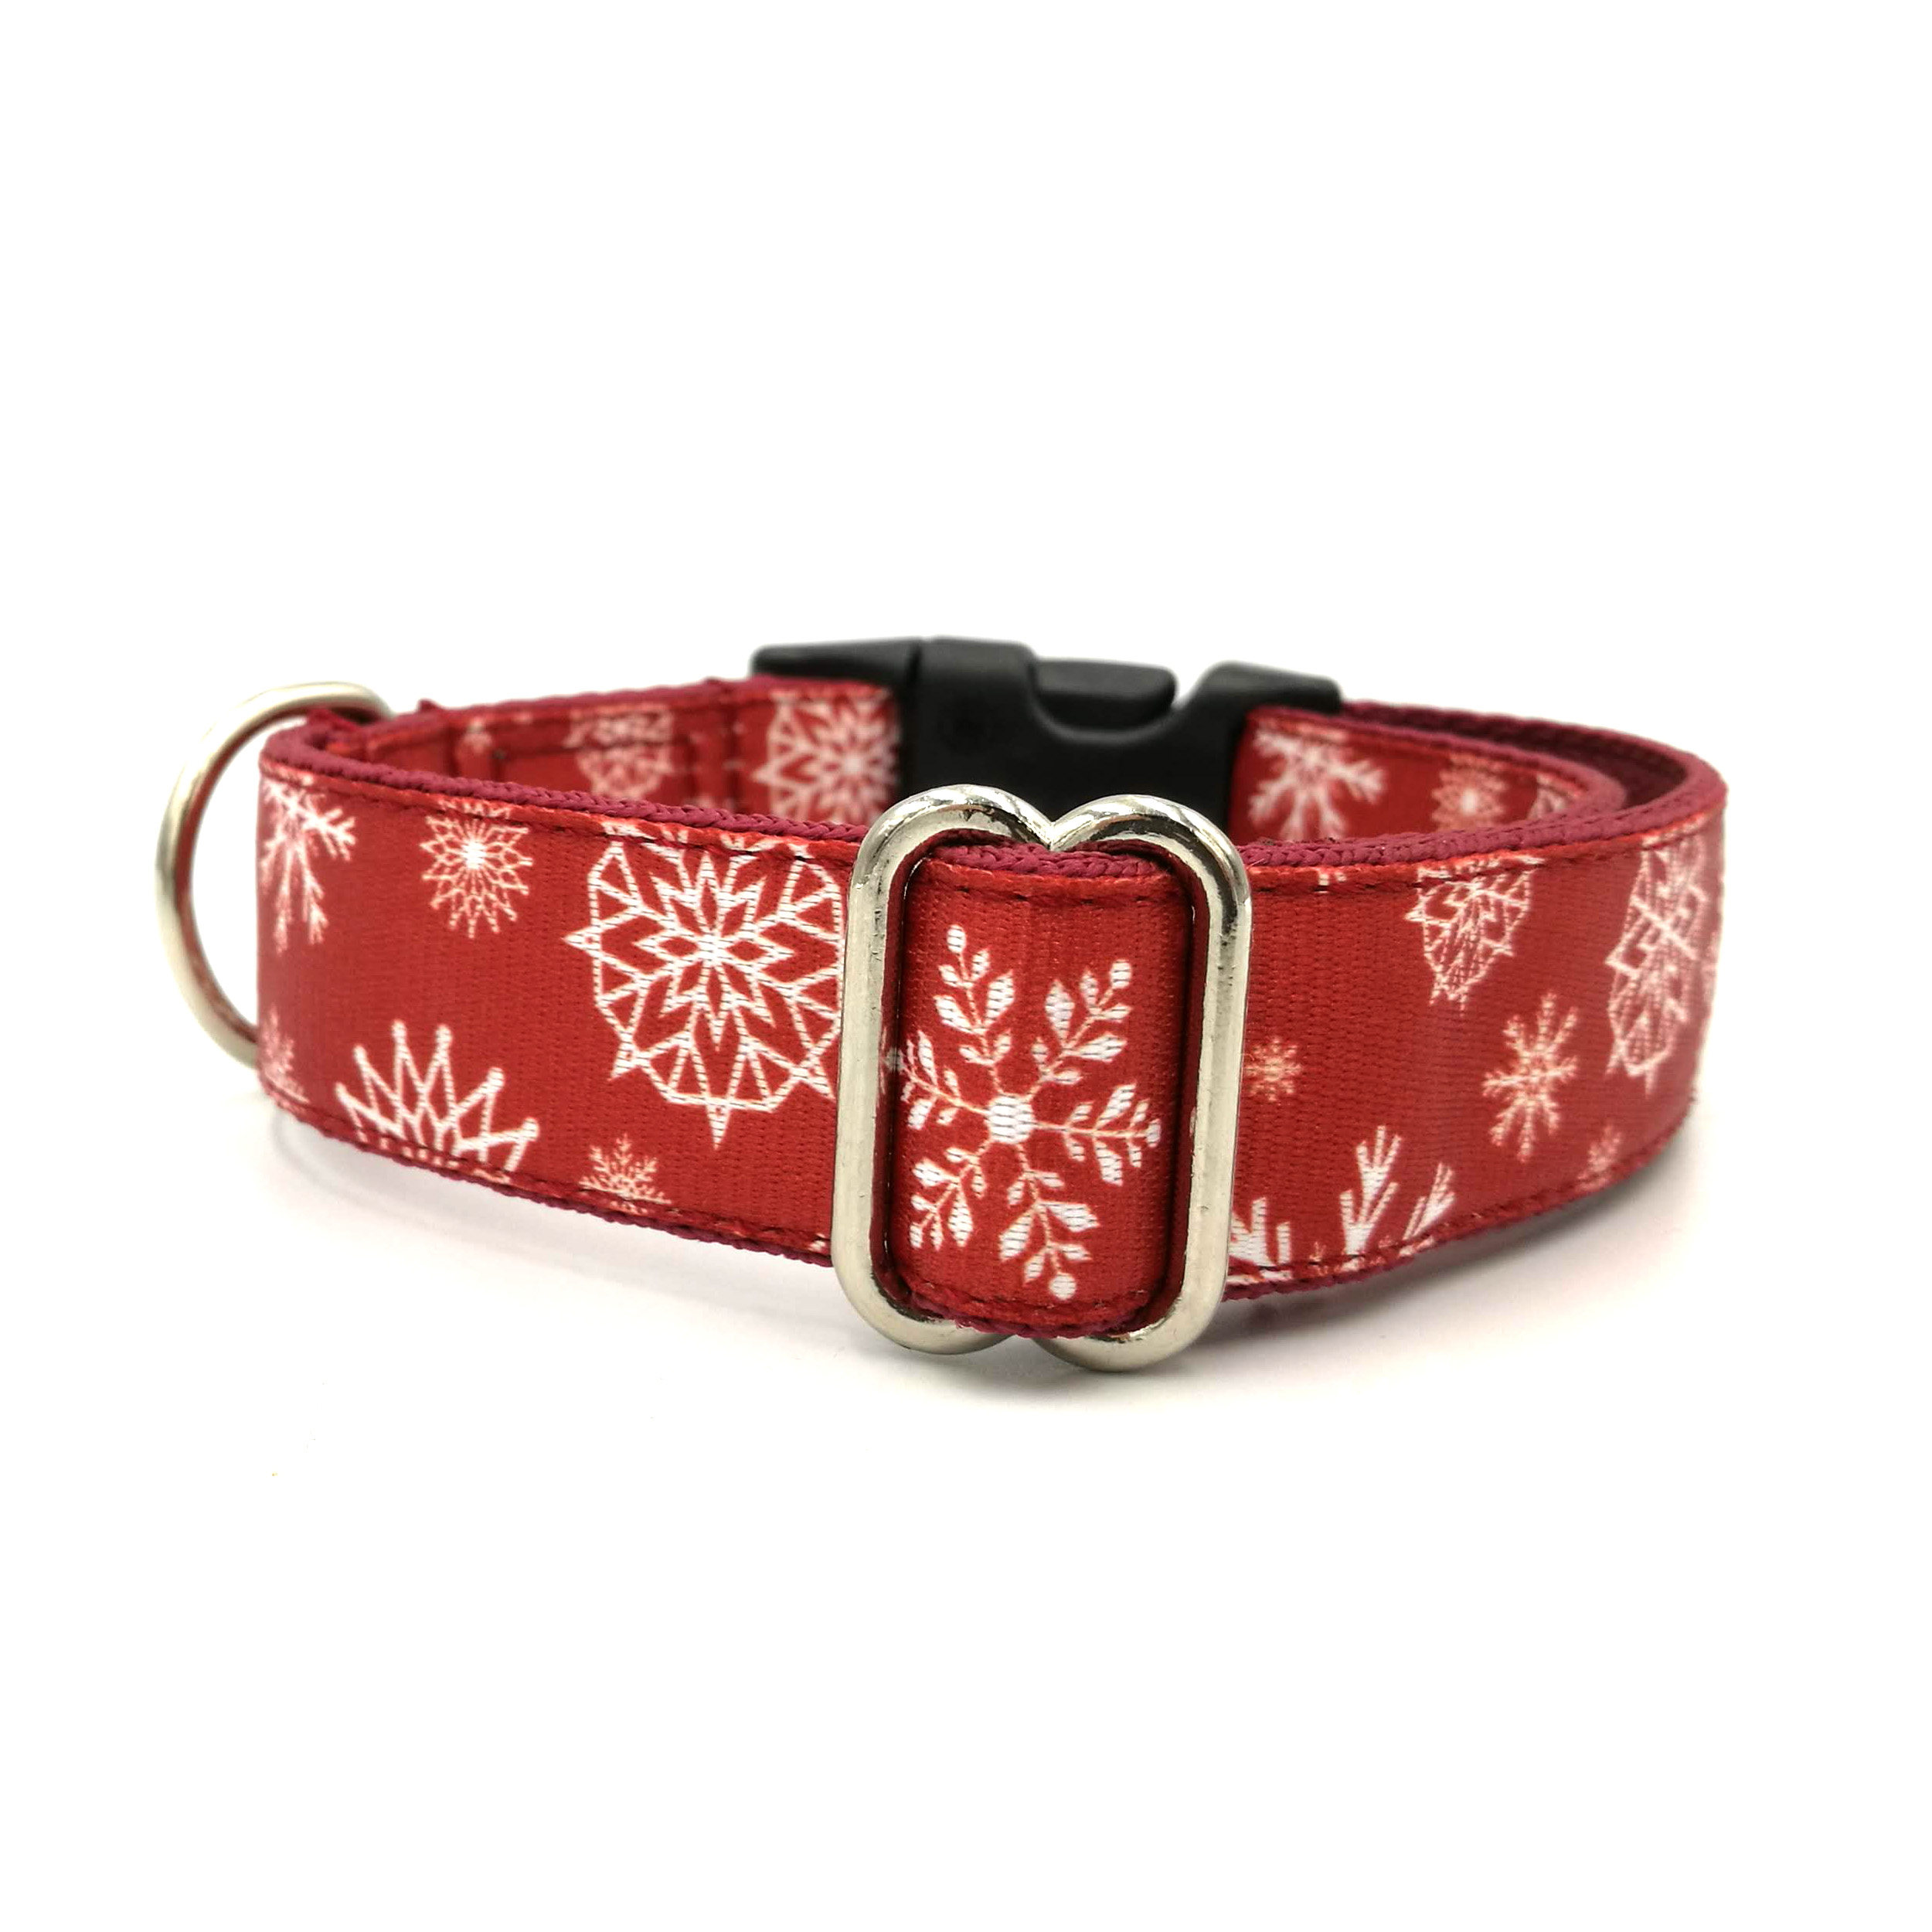 Snowflake patterned dog collar